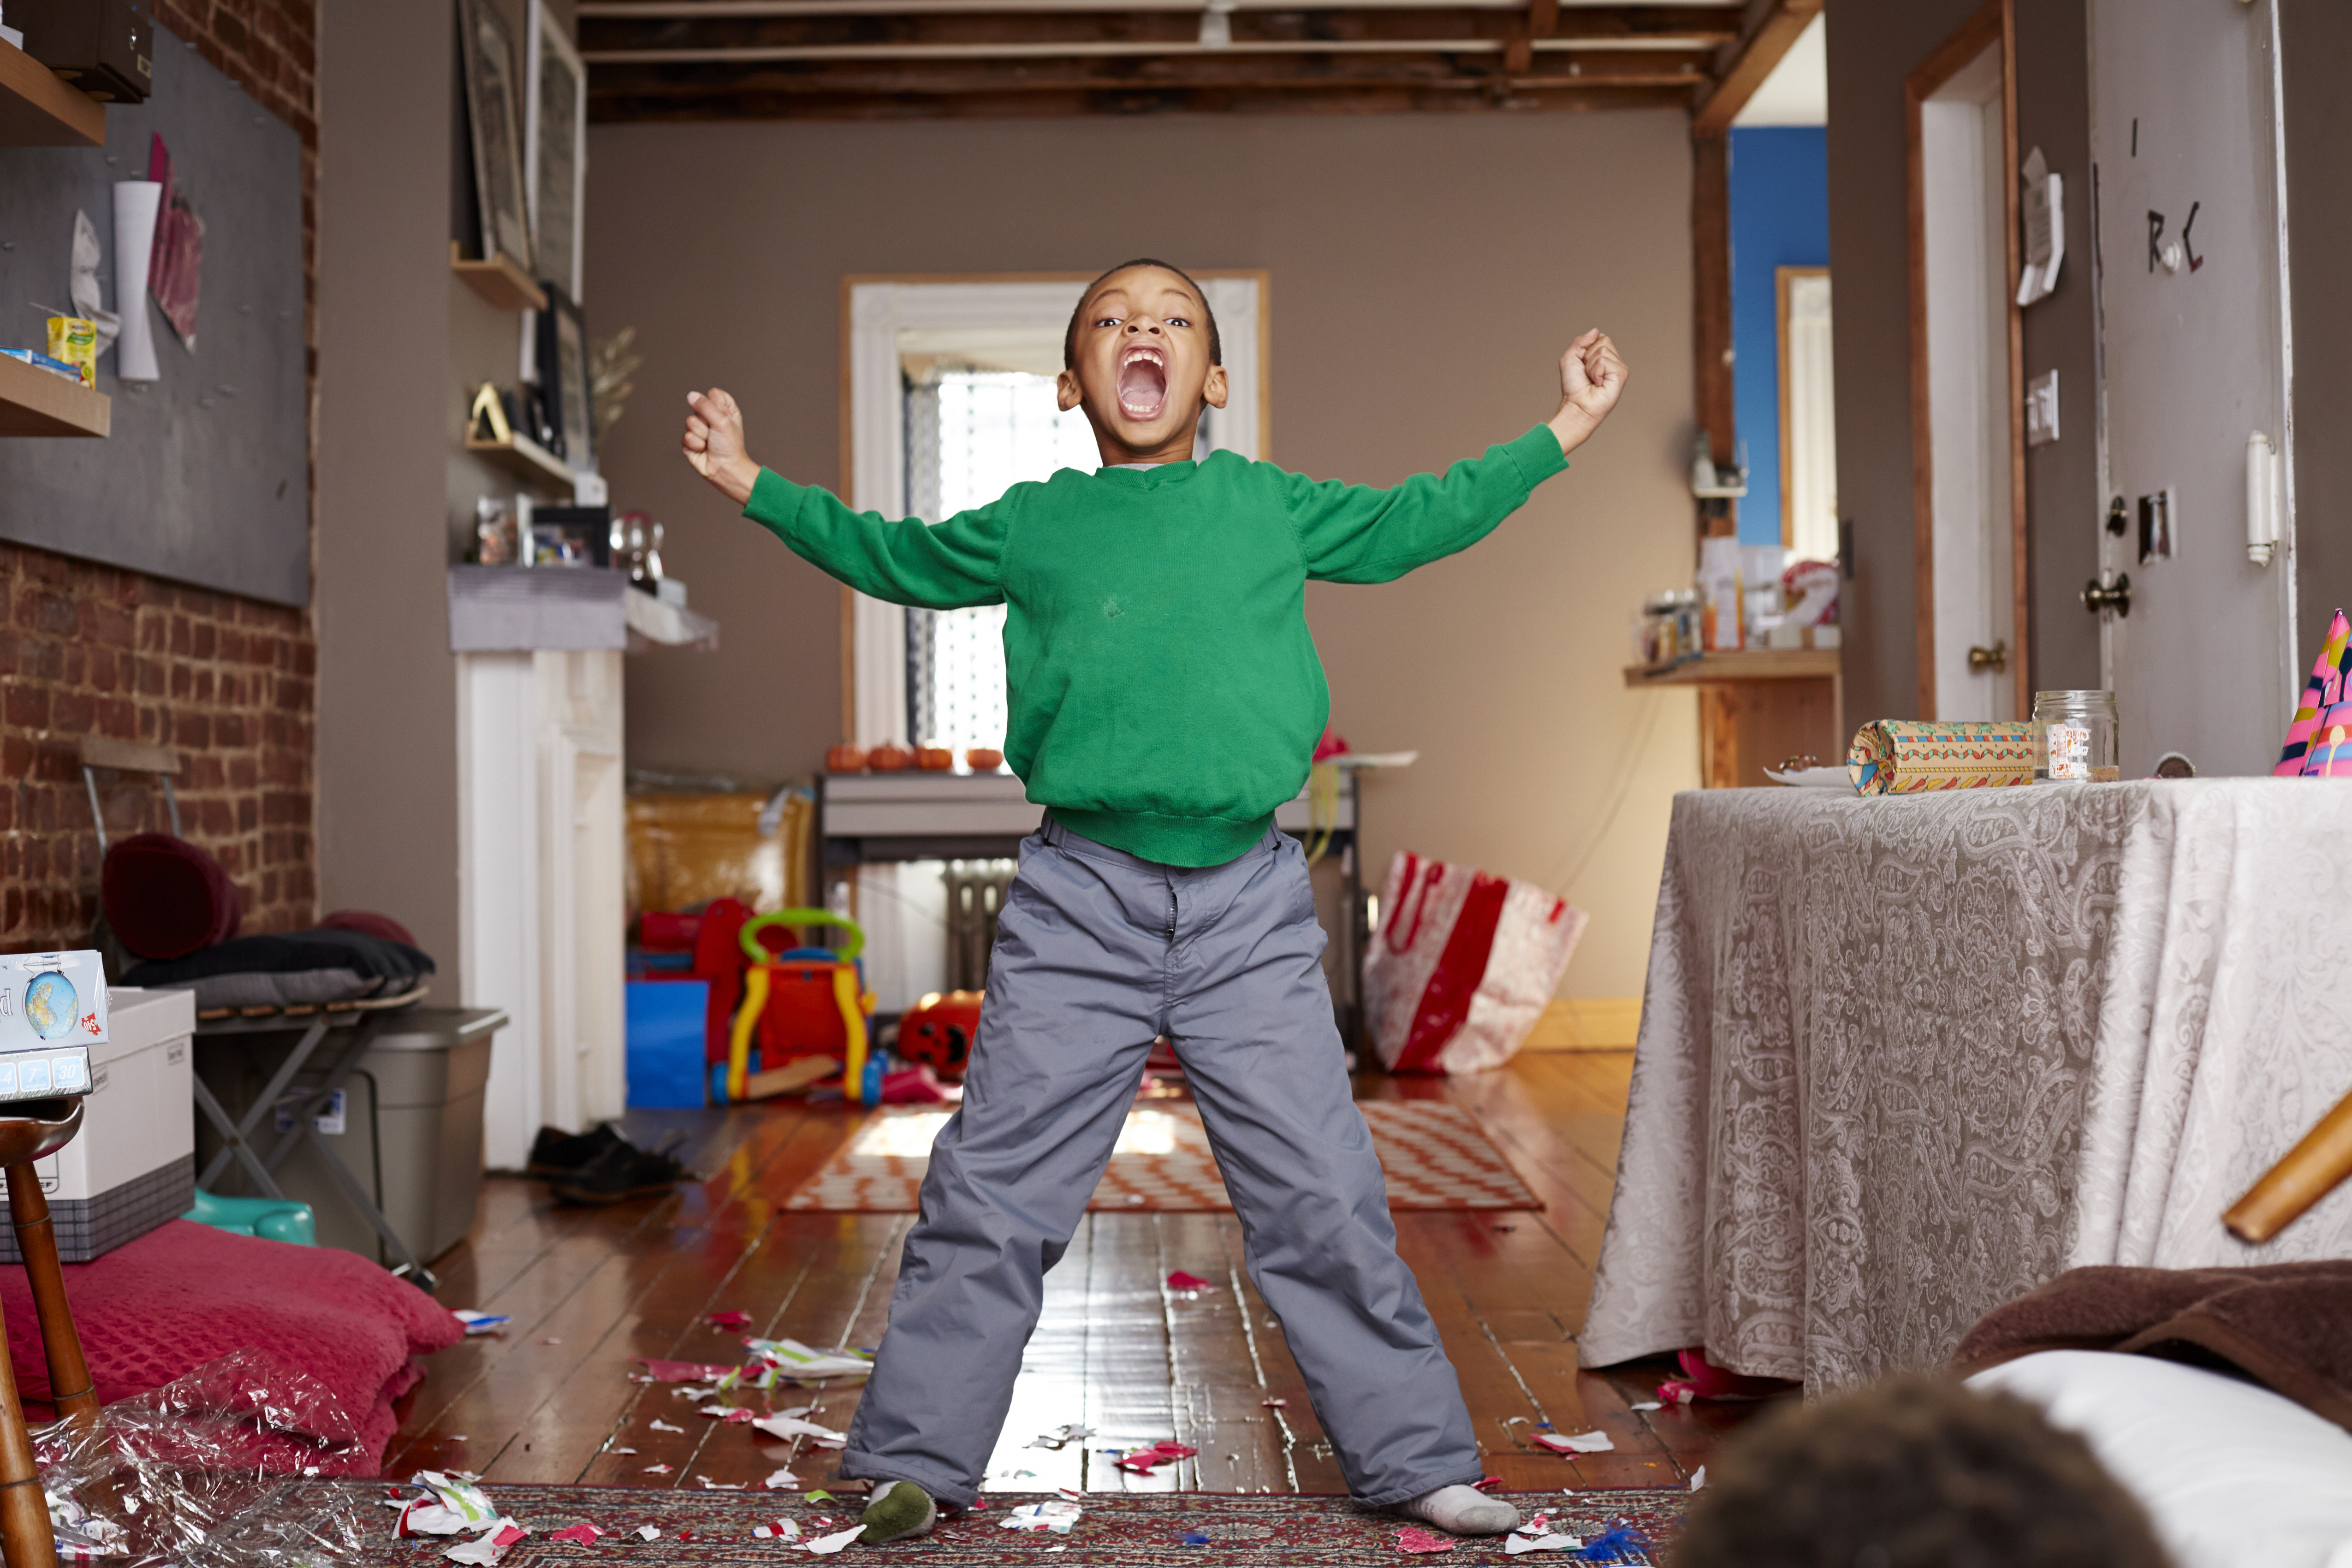 Black boy shouting in living room